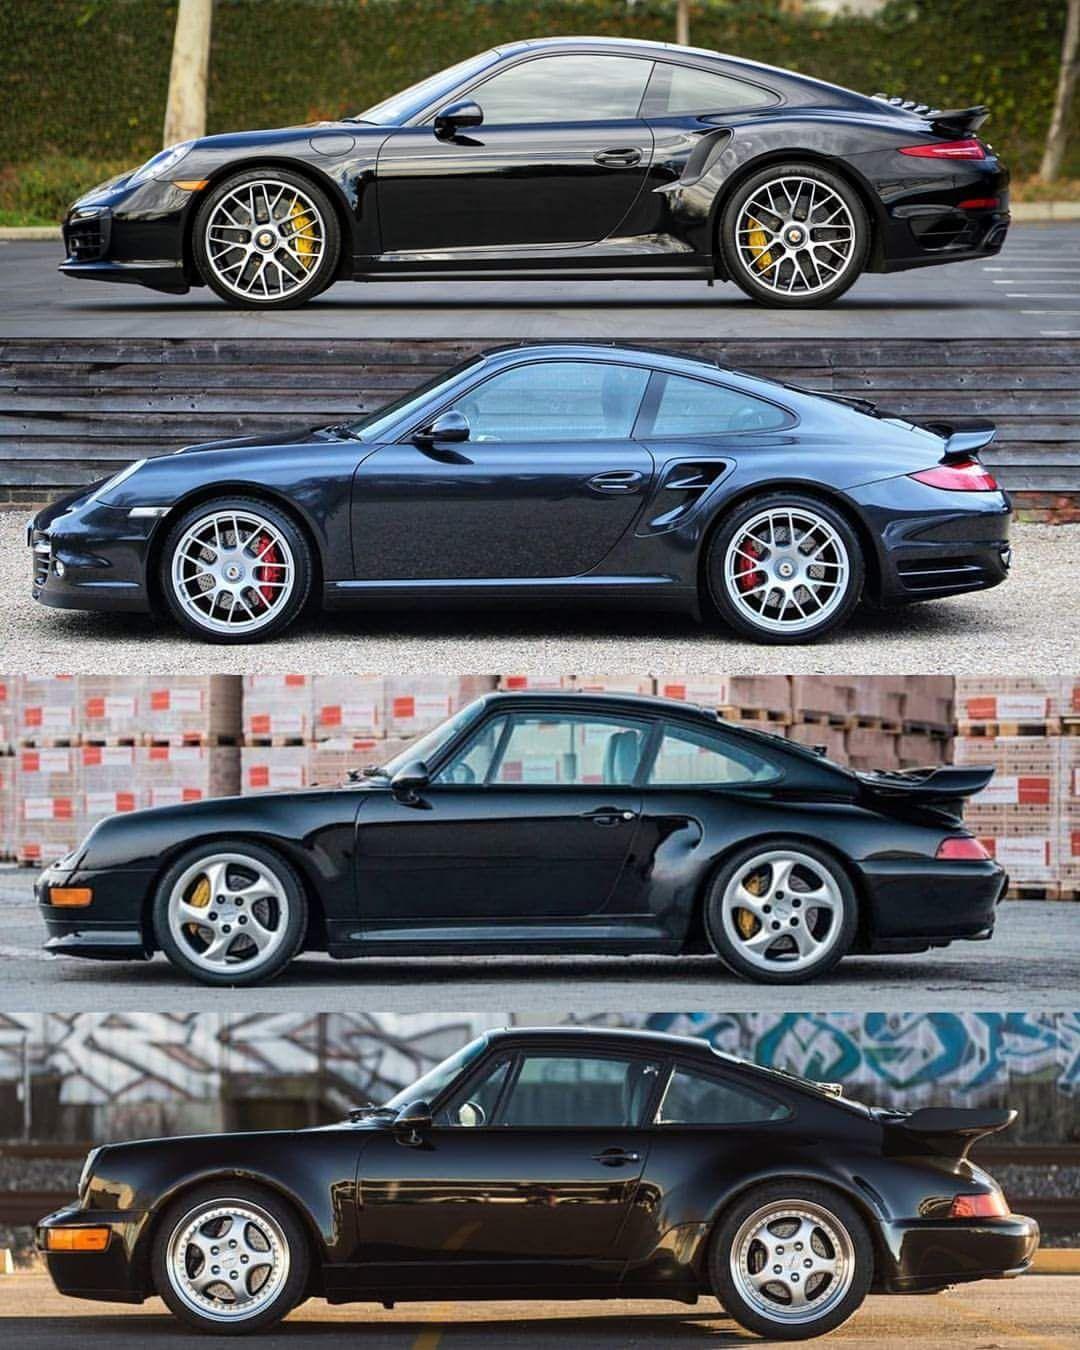 Turbo Generations Porsche Sports Car Porsche Cars Porsche 911 Turbo